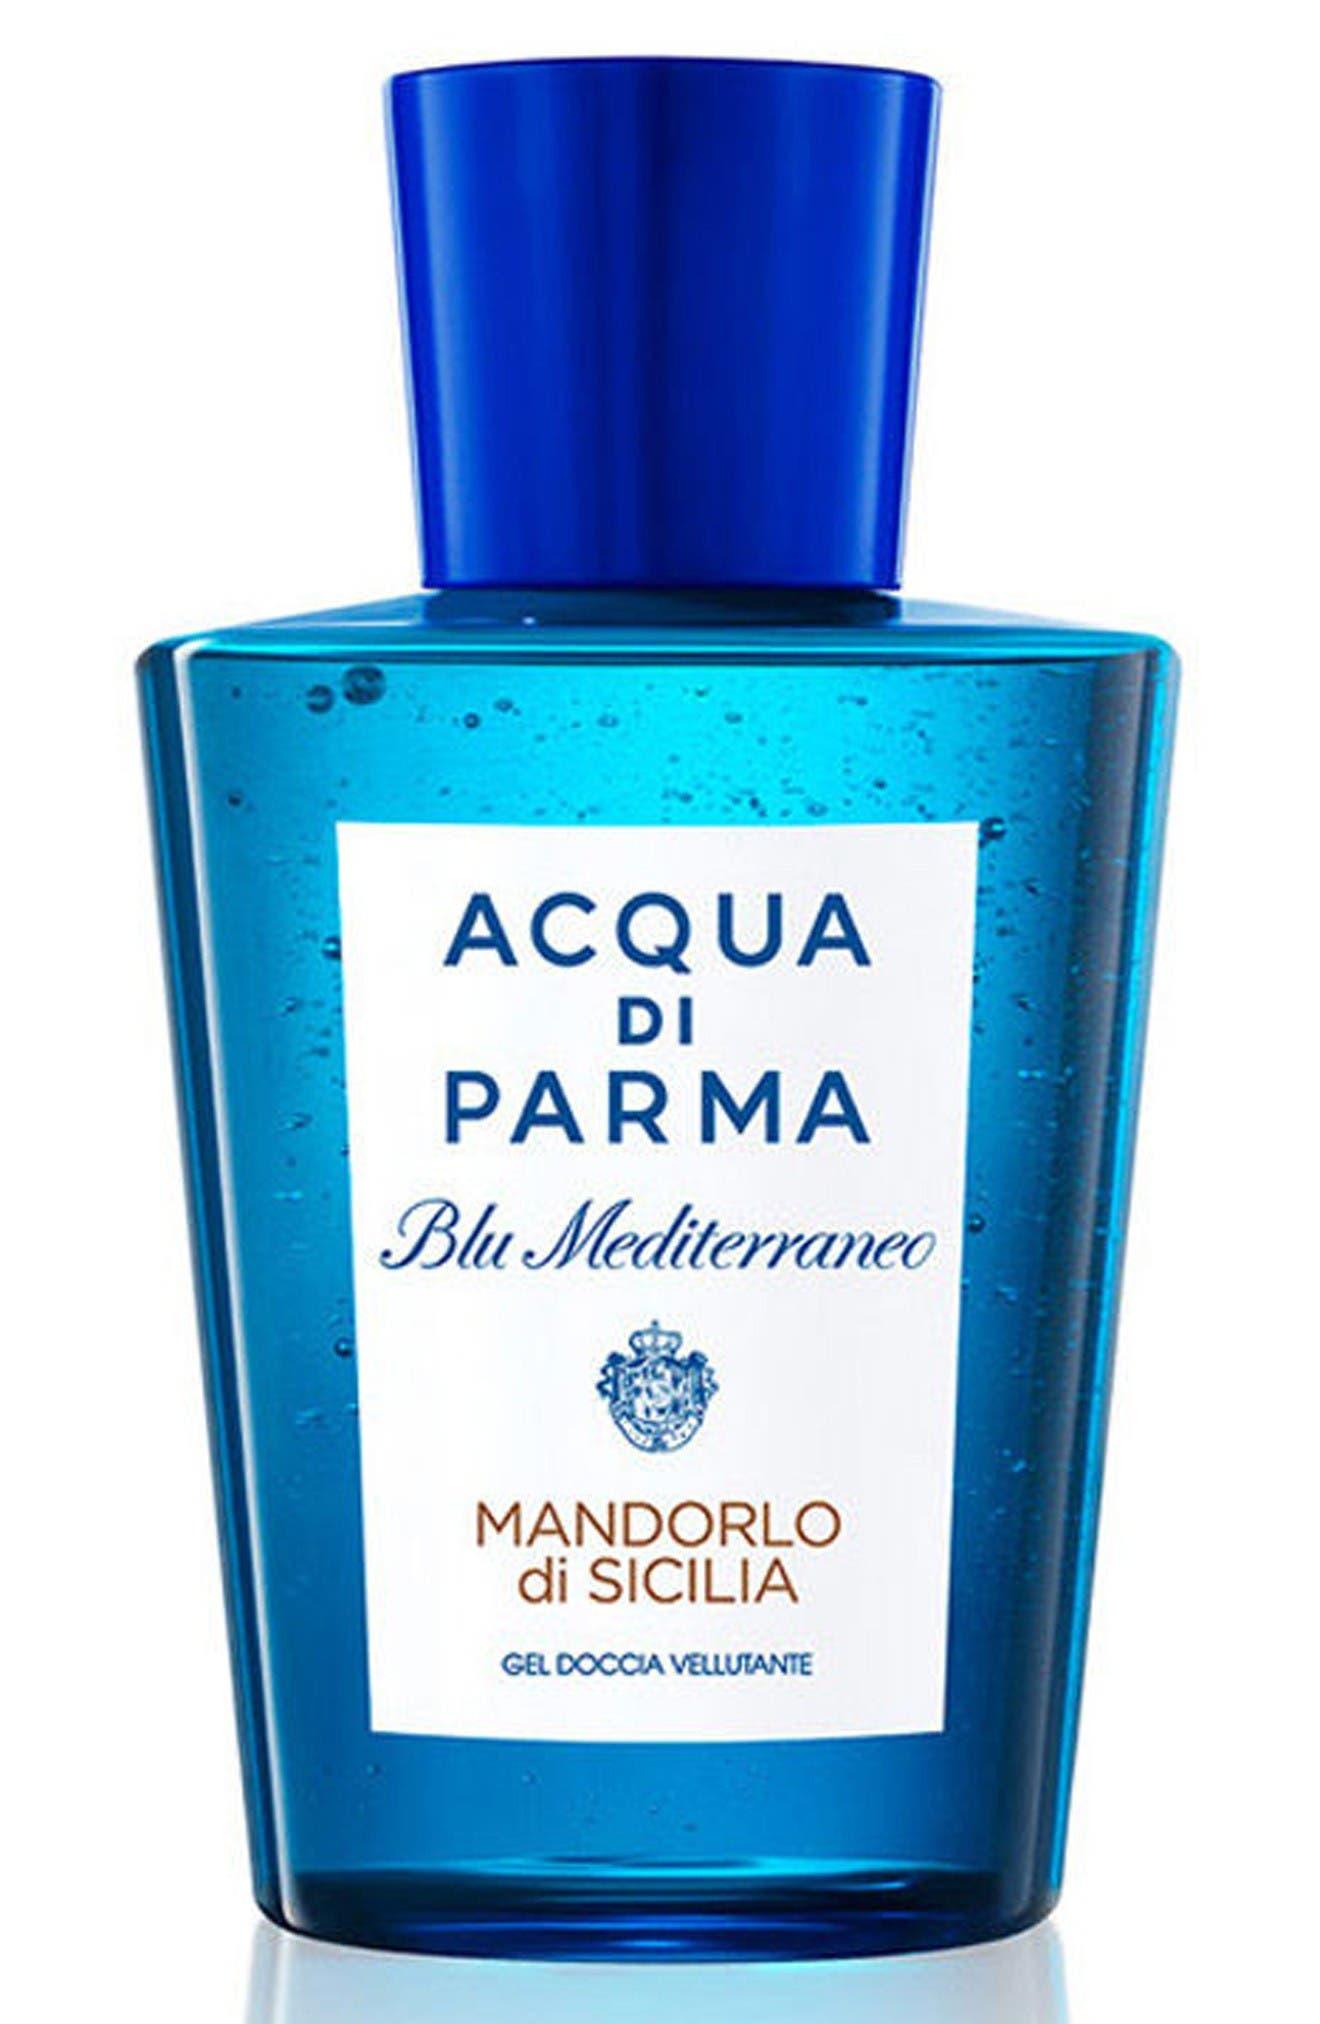 Acqua di Parma 'Blu Mediterraneo - Mandorlo di Sicilia' Shower Gel